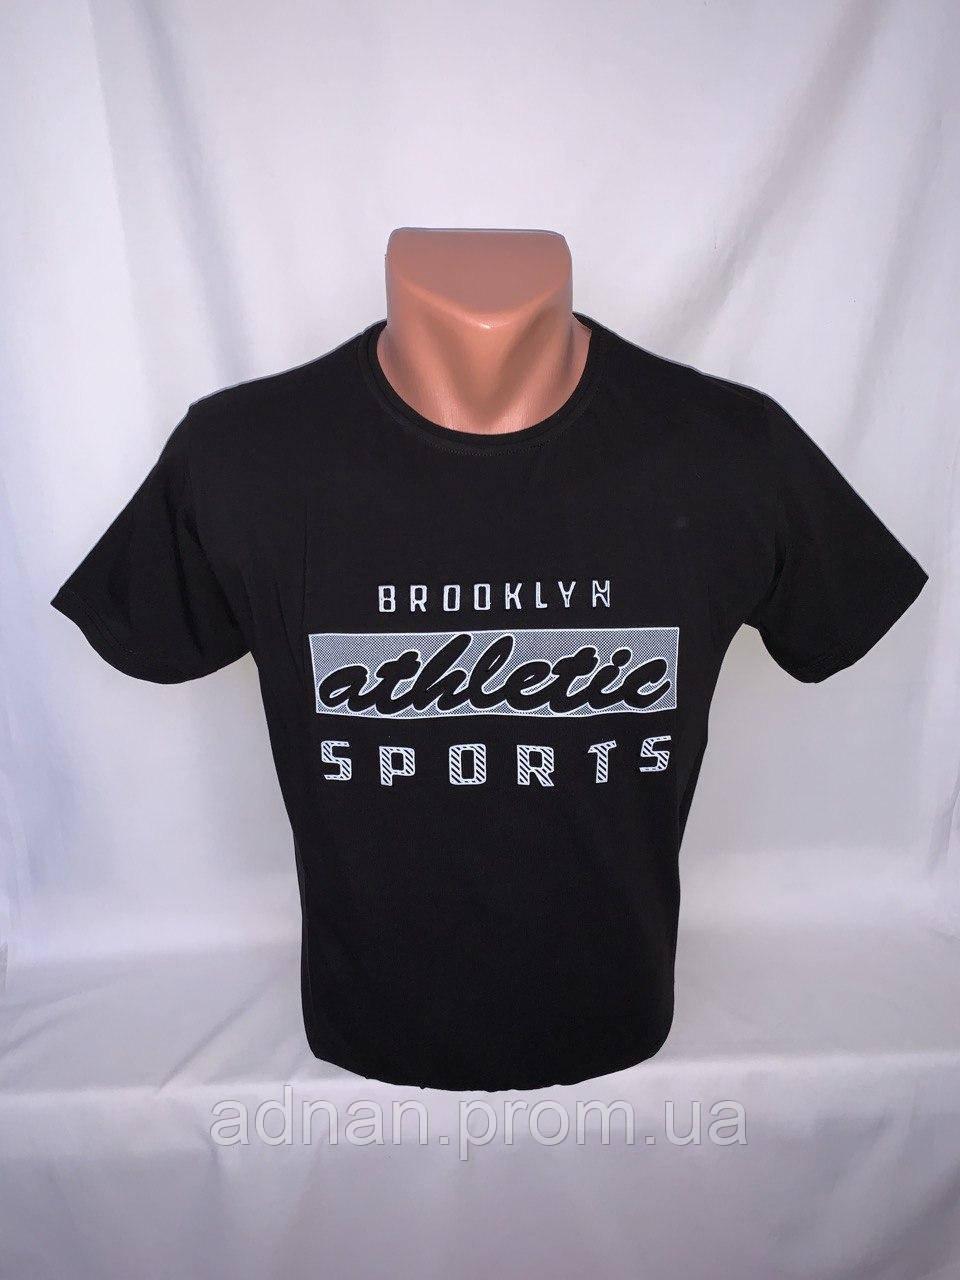 Футболка мужская RBS, накатка стрейч коттон ATHLETIC 006 \ купить футболку мужскую оптом